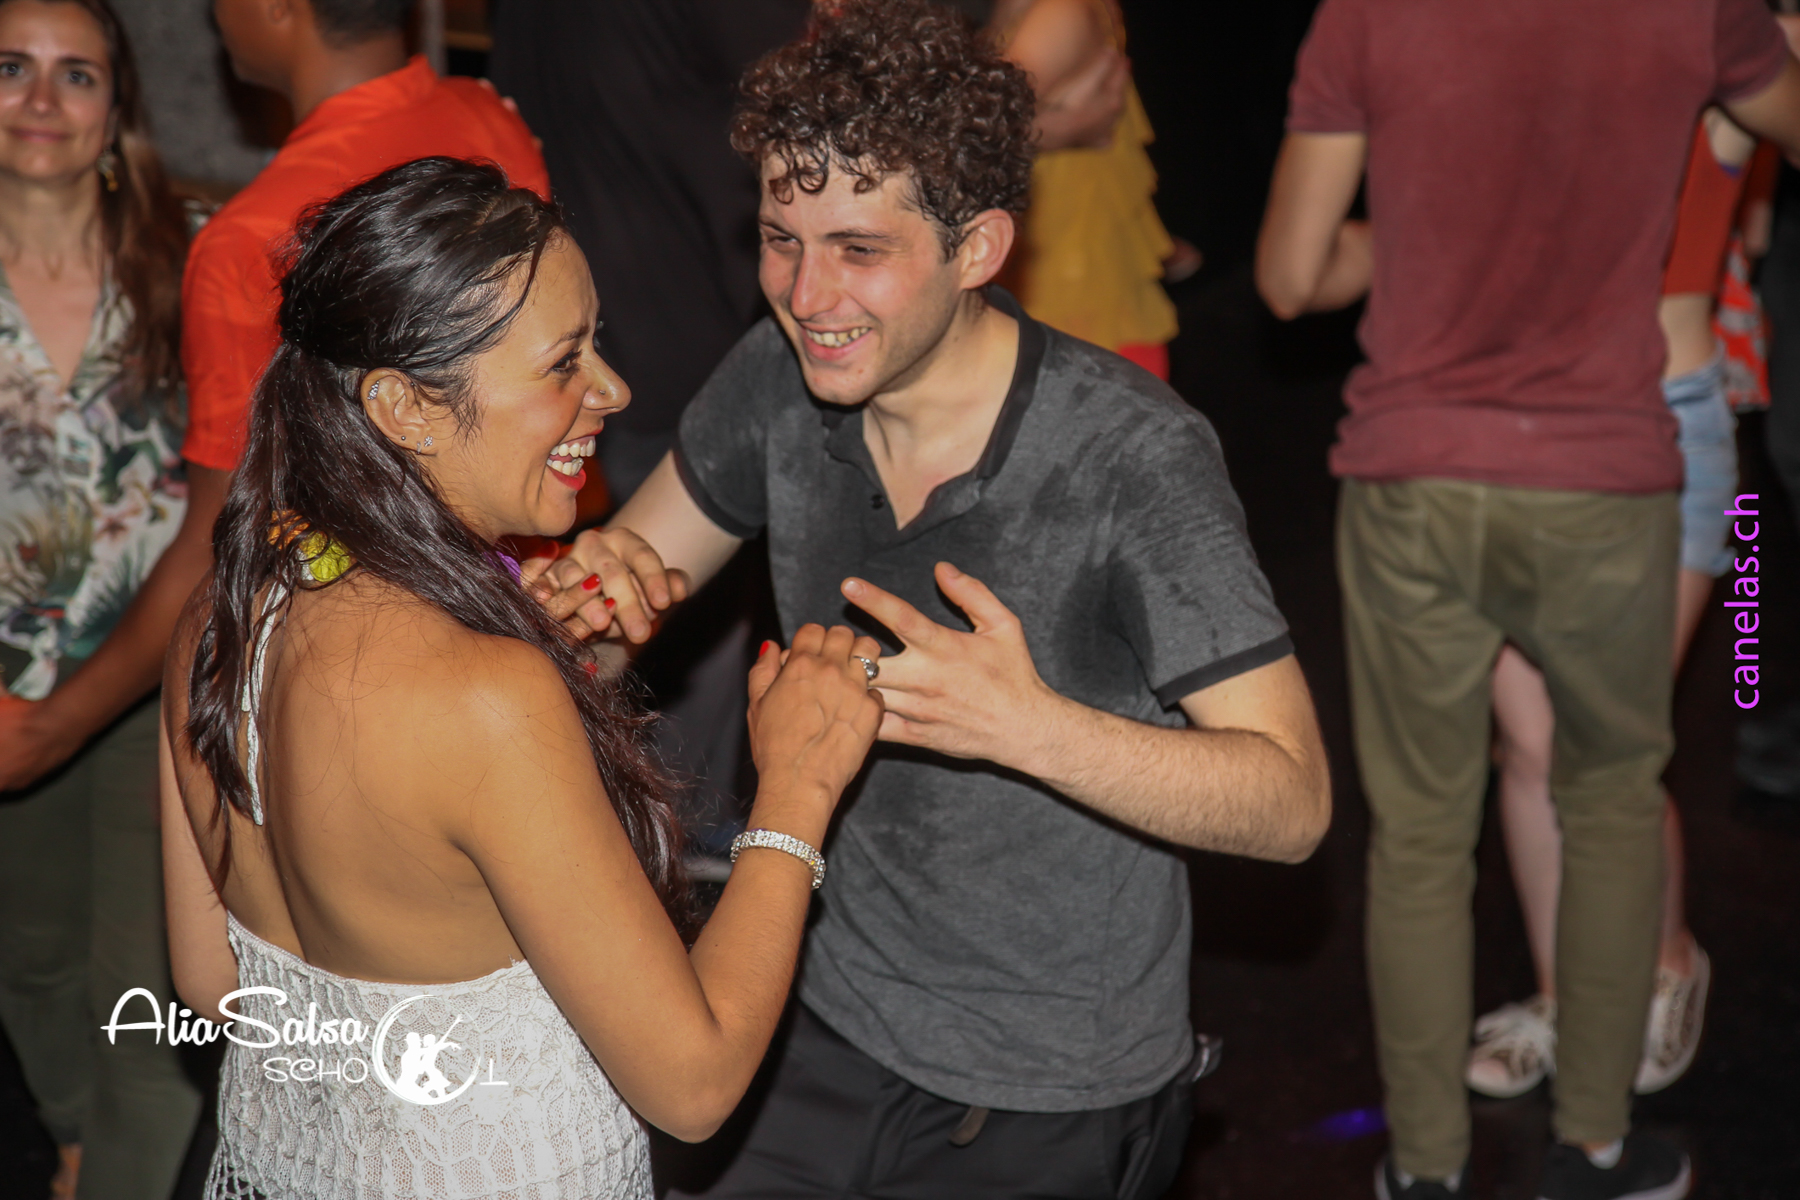 AliaSalsa ecole de danse lausanne soiree bachata salsa cubaineAlia Salsa Soireé Salsa - Bachata-57